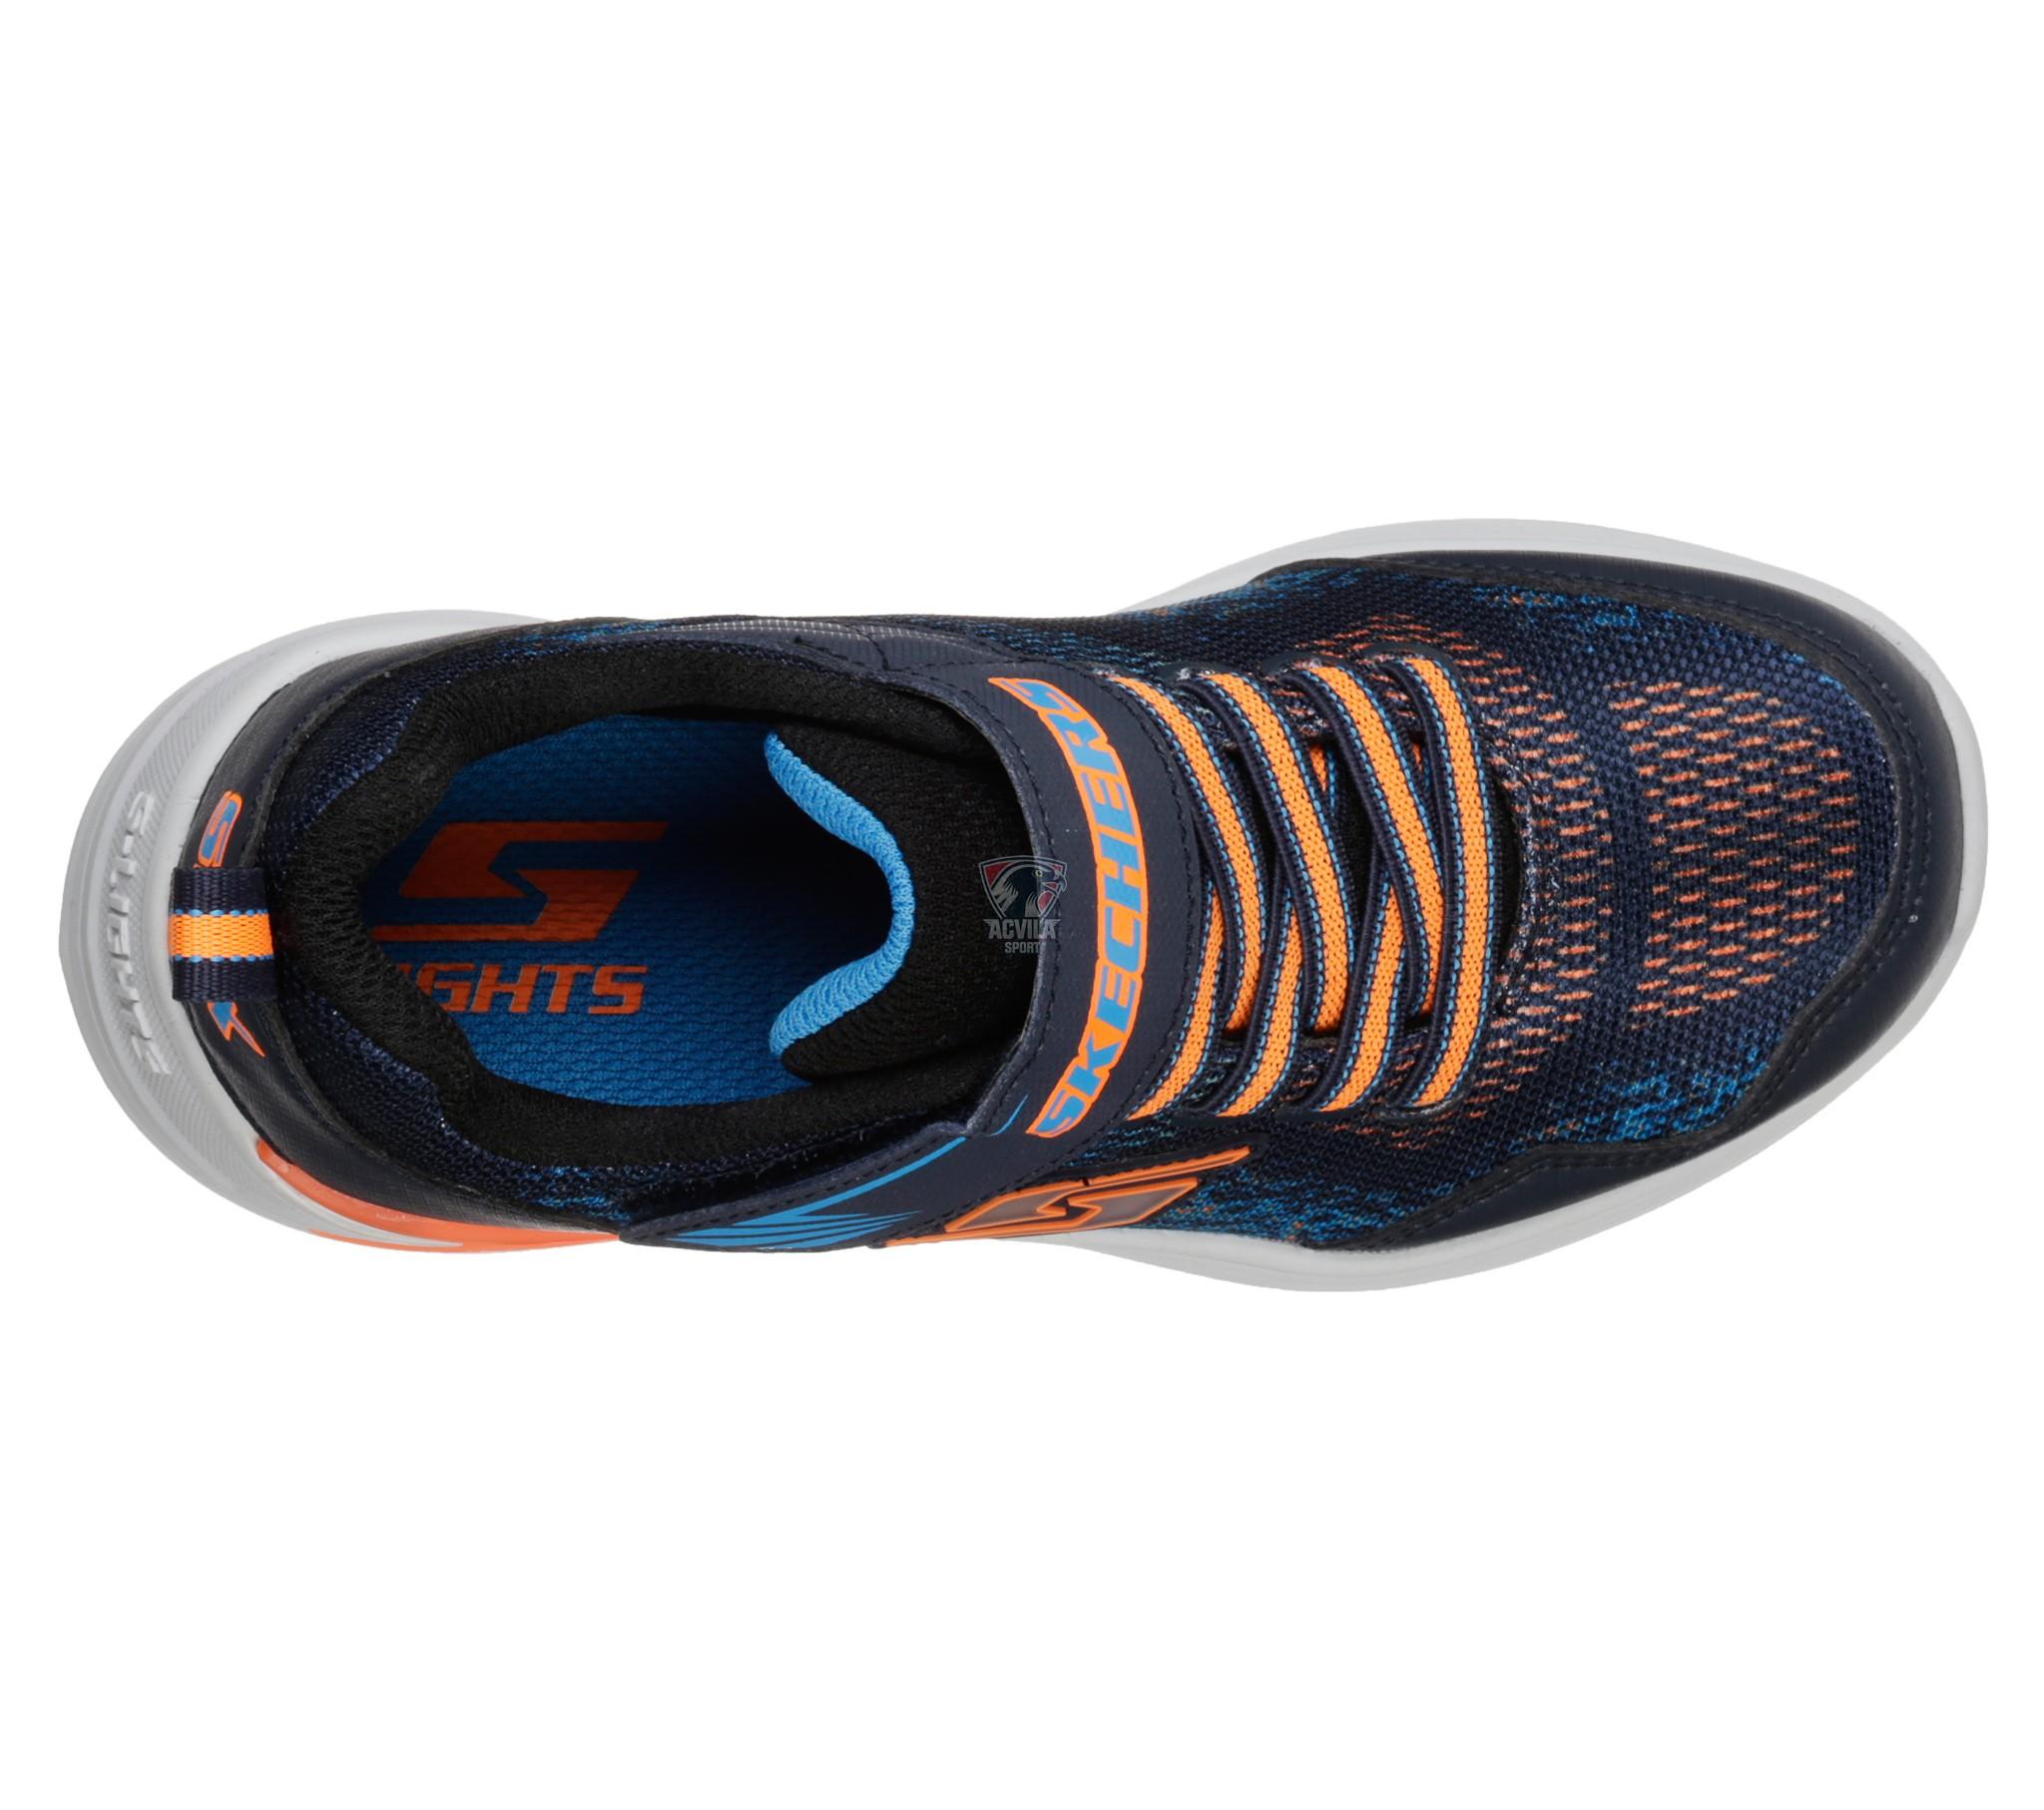 photo 7 Спортивная детская обувь SKECHERS ERUPTERS III DERLO